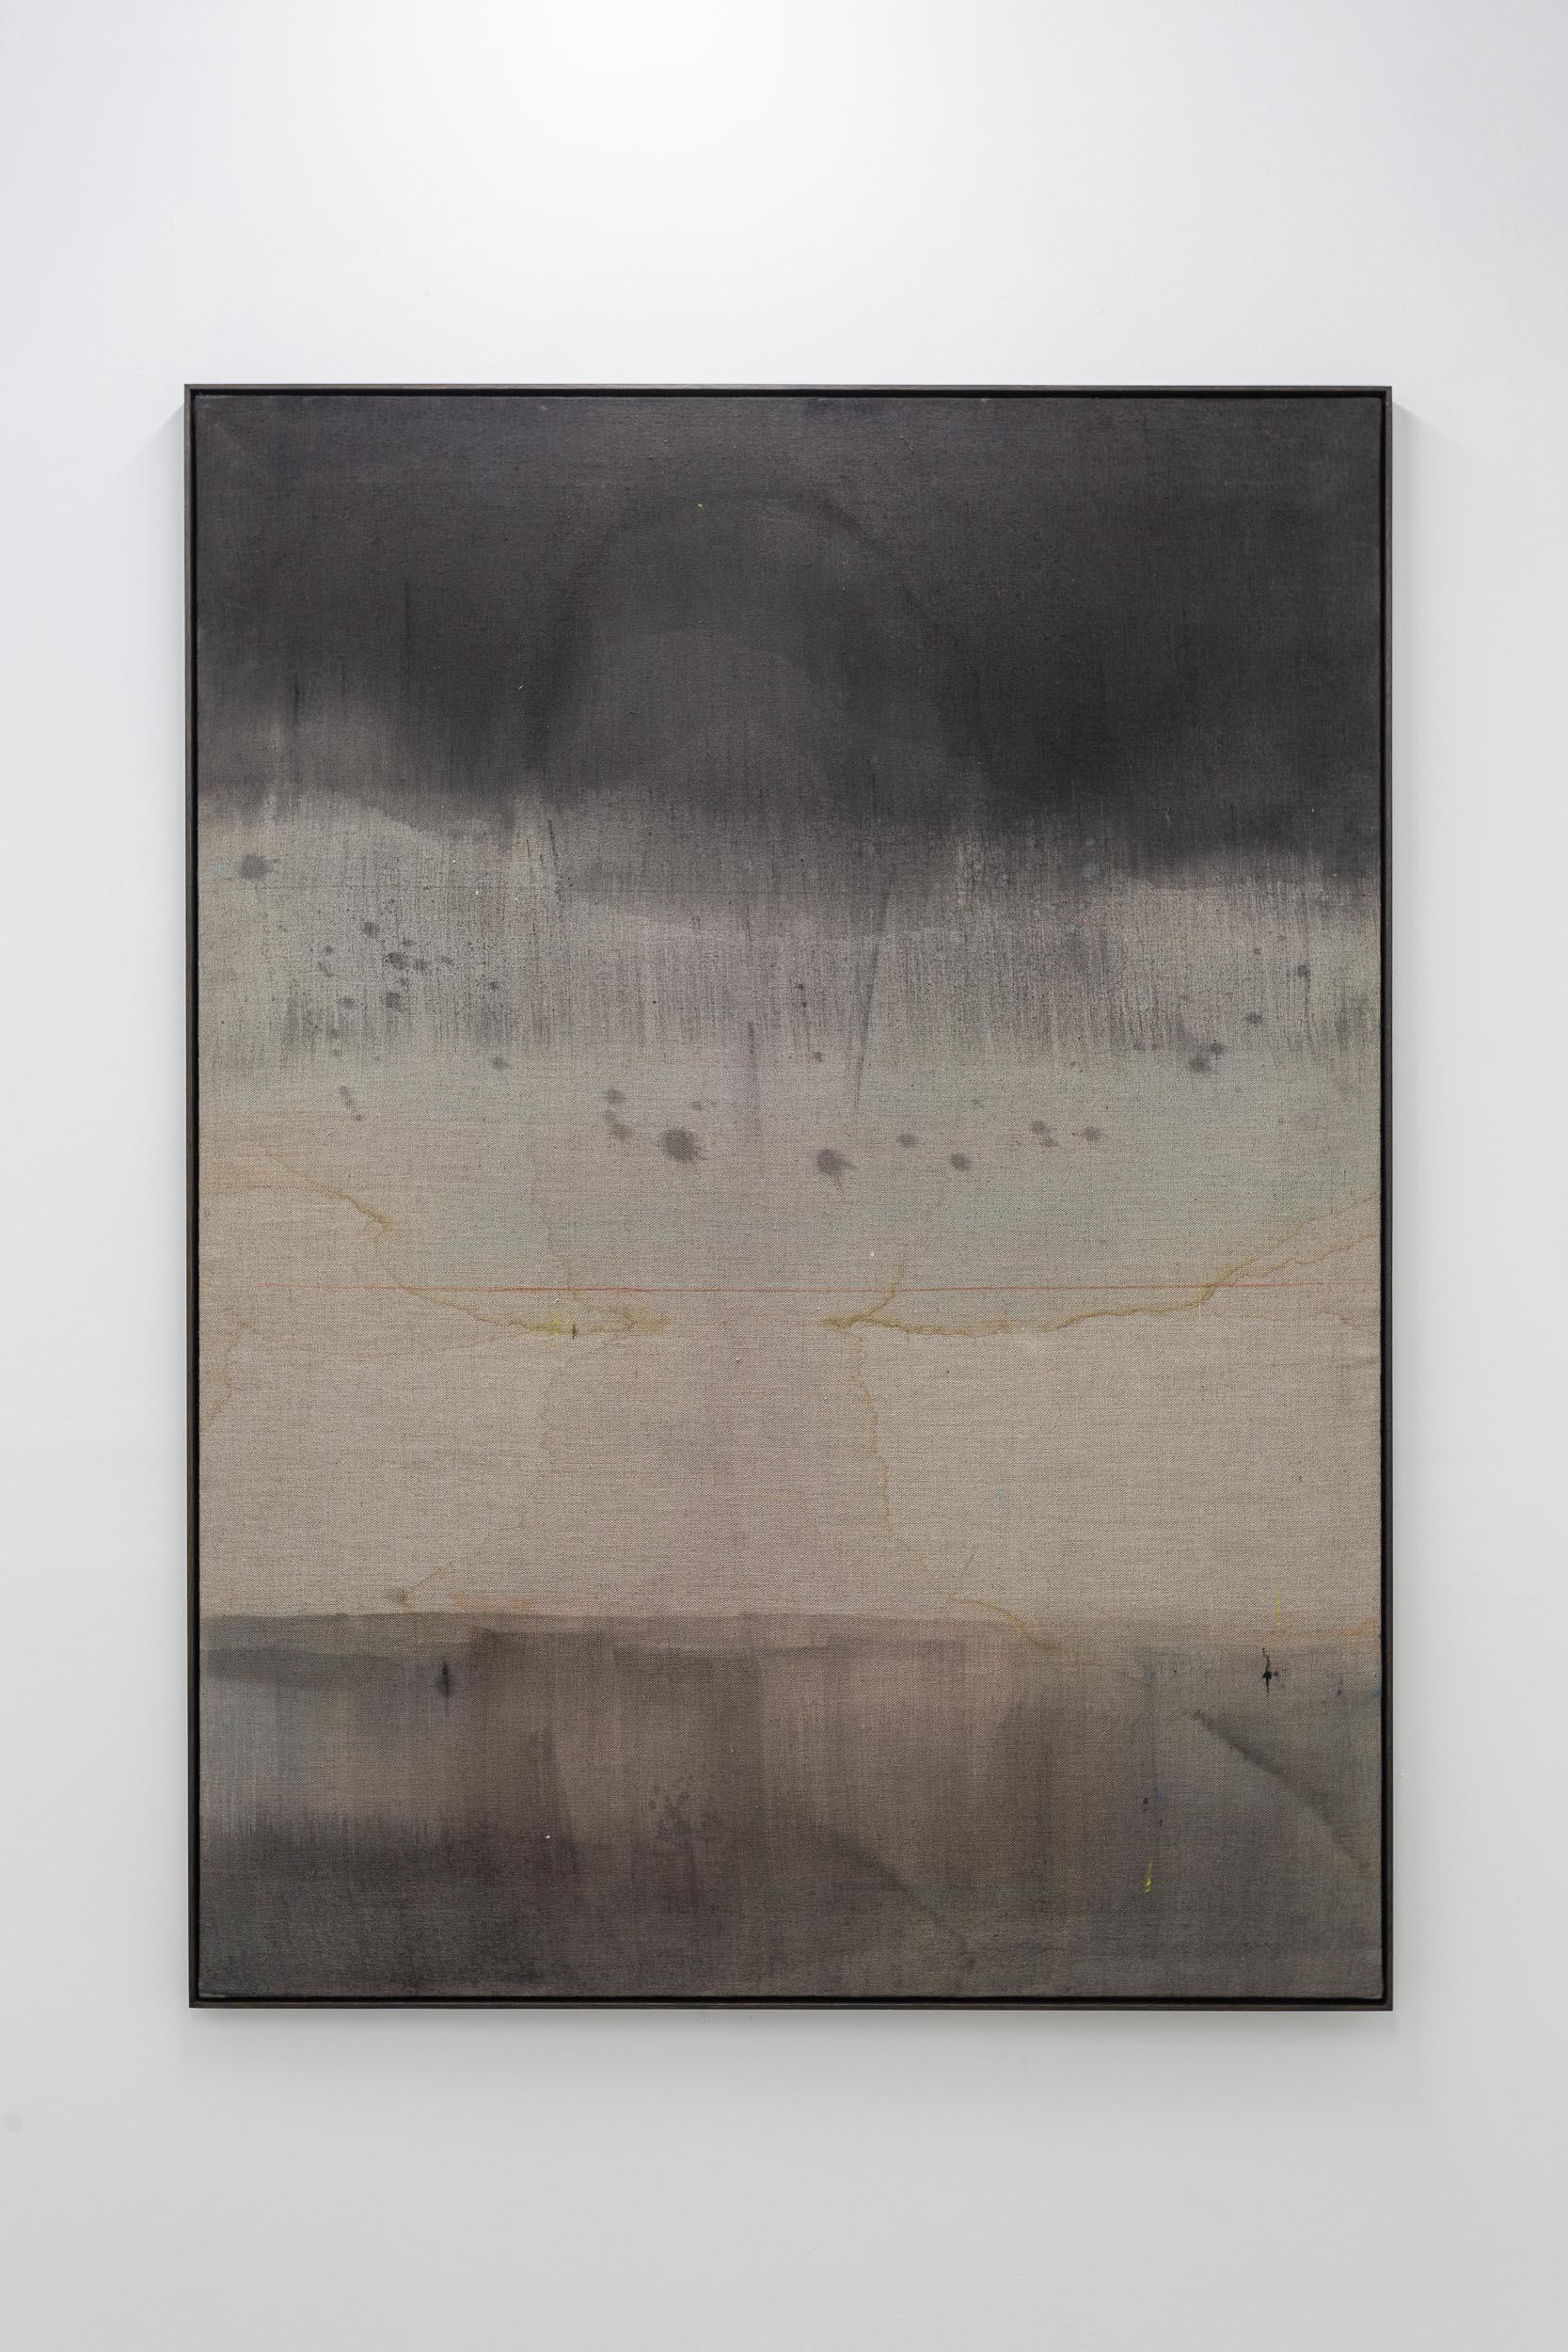 Kirstine Roepstorff,  Illustration #Simmering ,   2017, pigment, cloth, linen, 102 x 137.5 cm  Photo: Kilian Bannwart